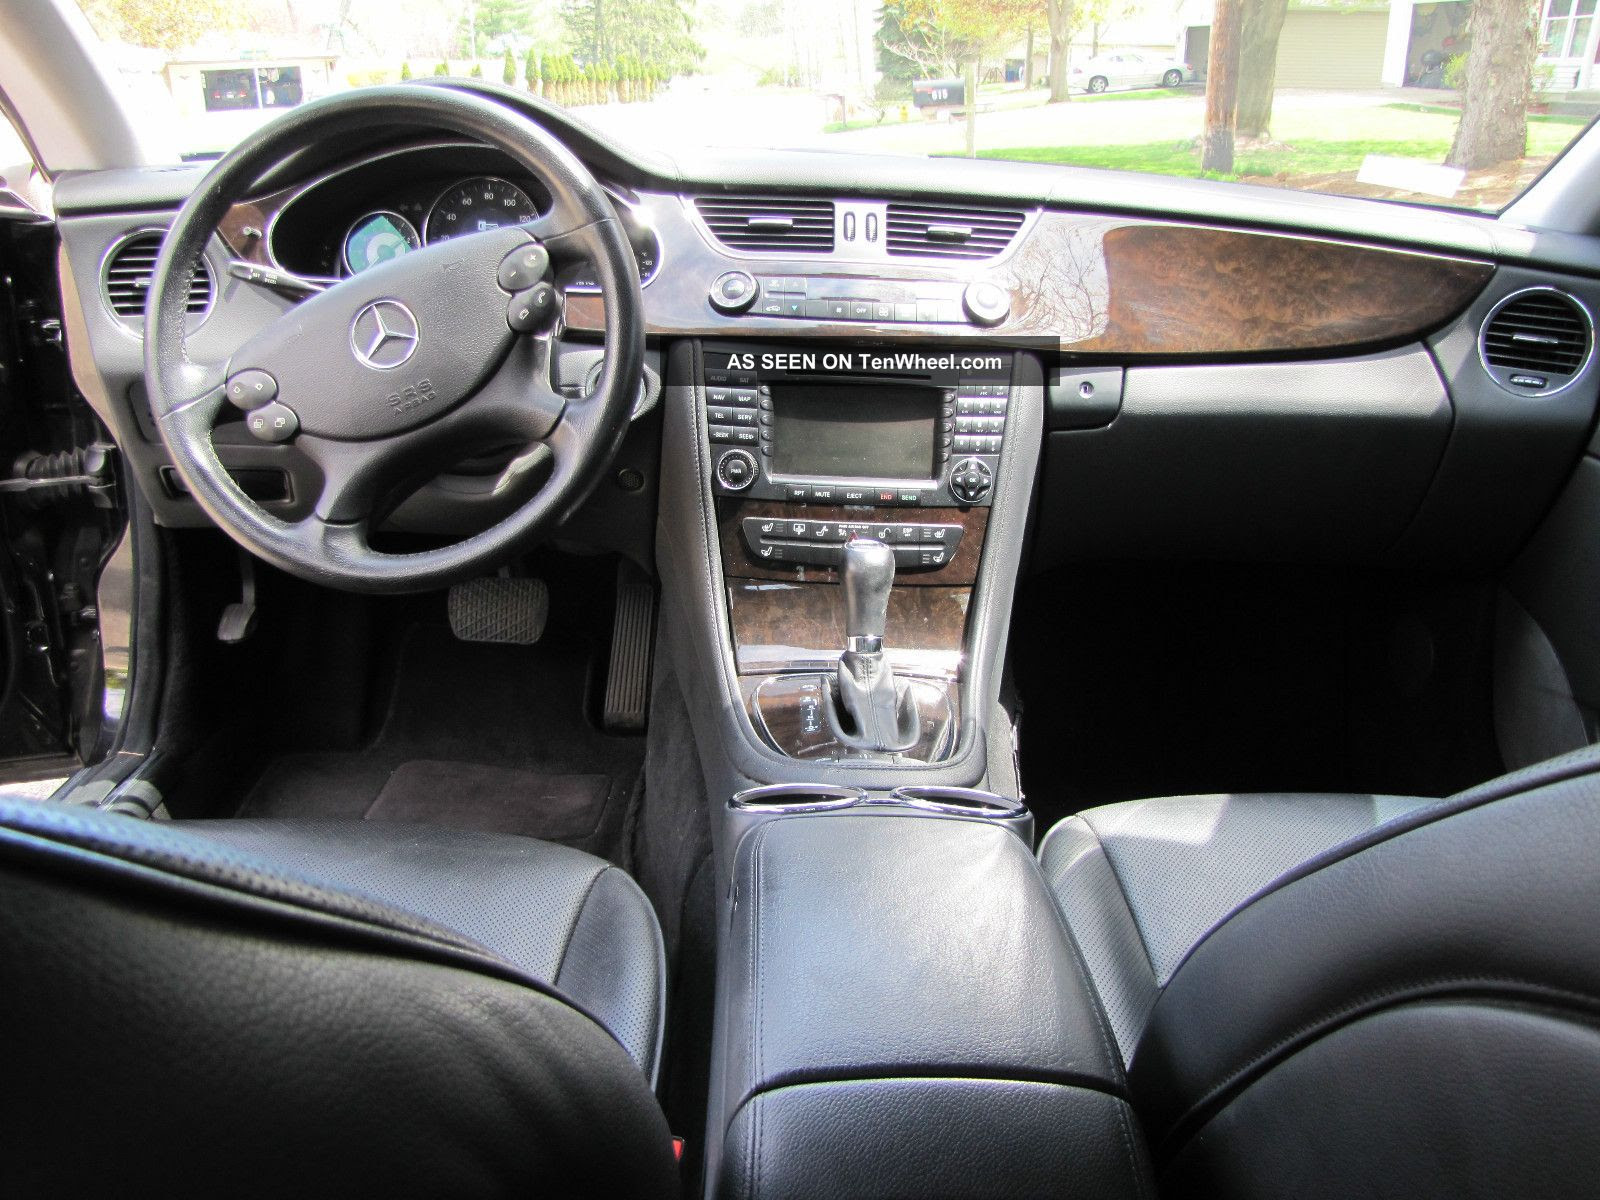 2006 Mercedes Benz Cls 500 Amg Sport Edition